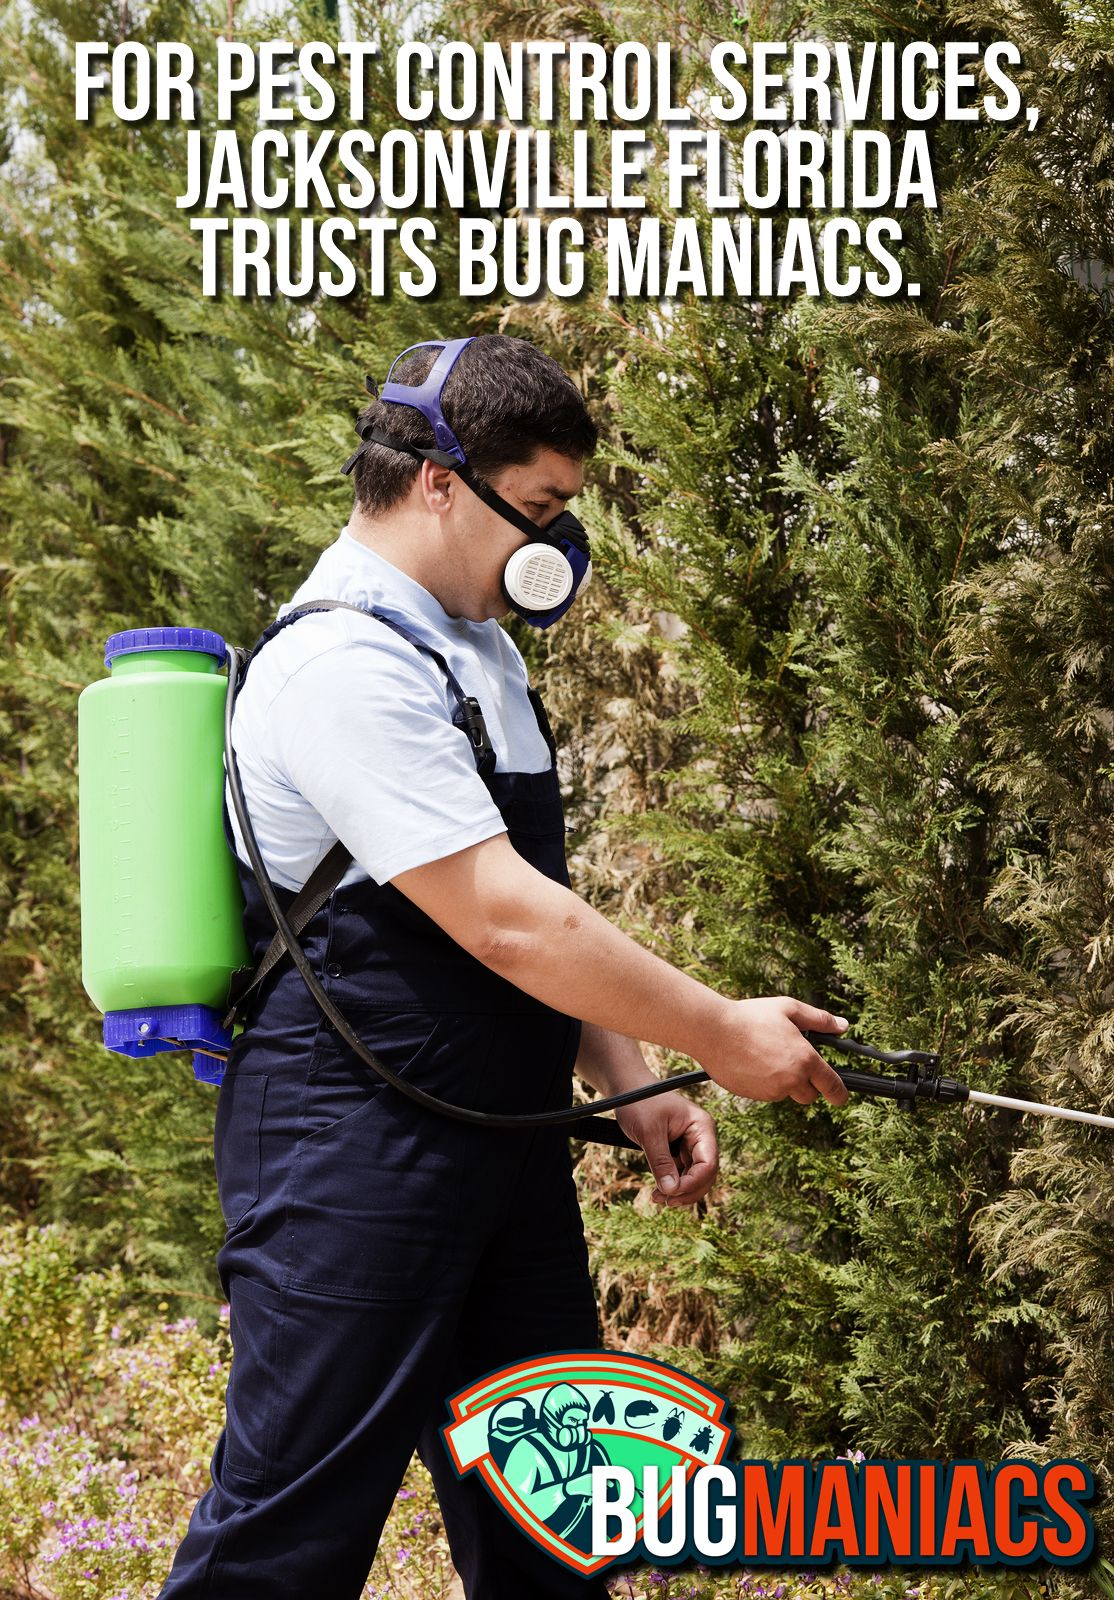 For pest control services jacksonville florida trusts bug